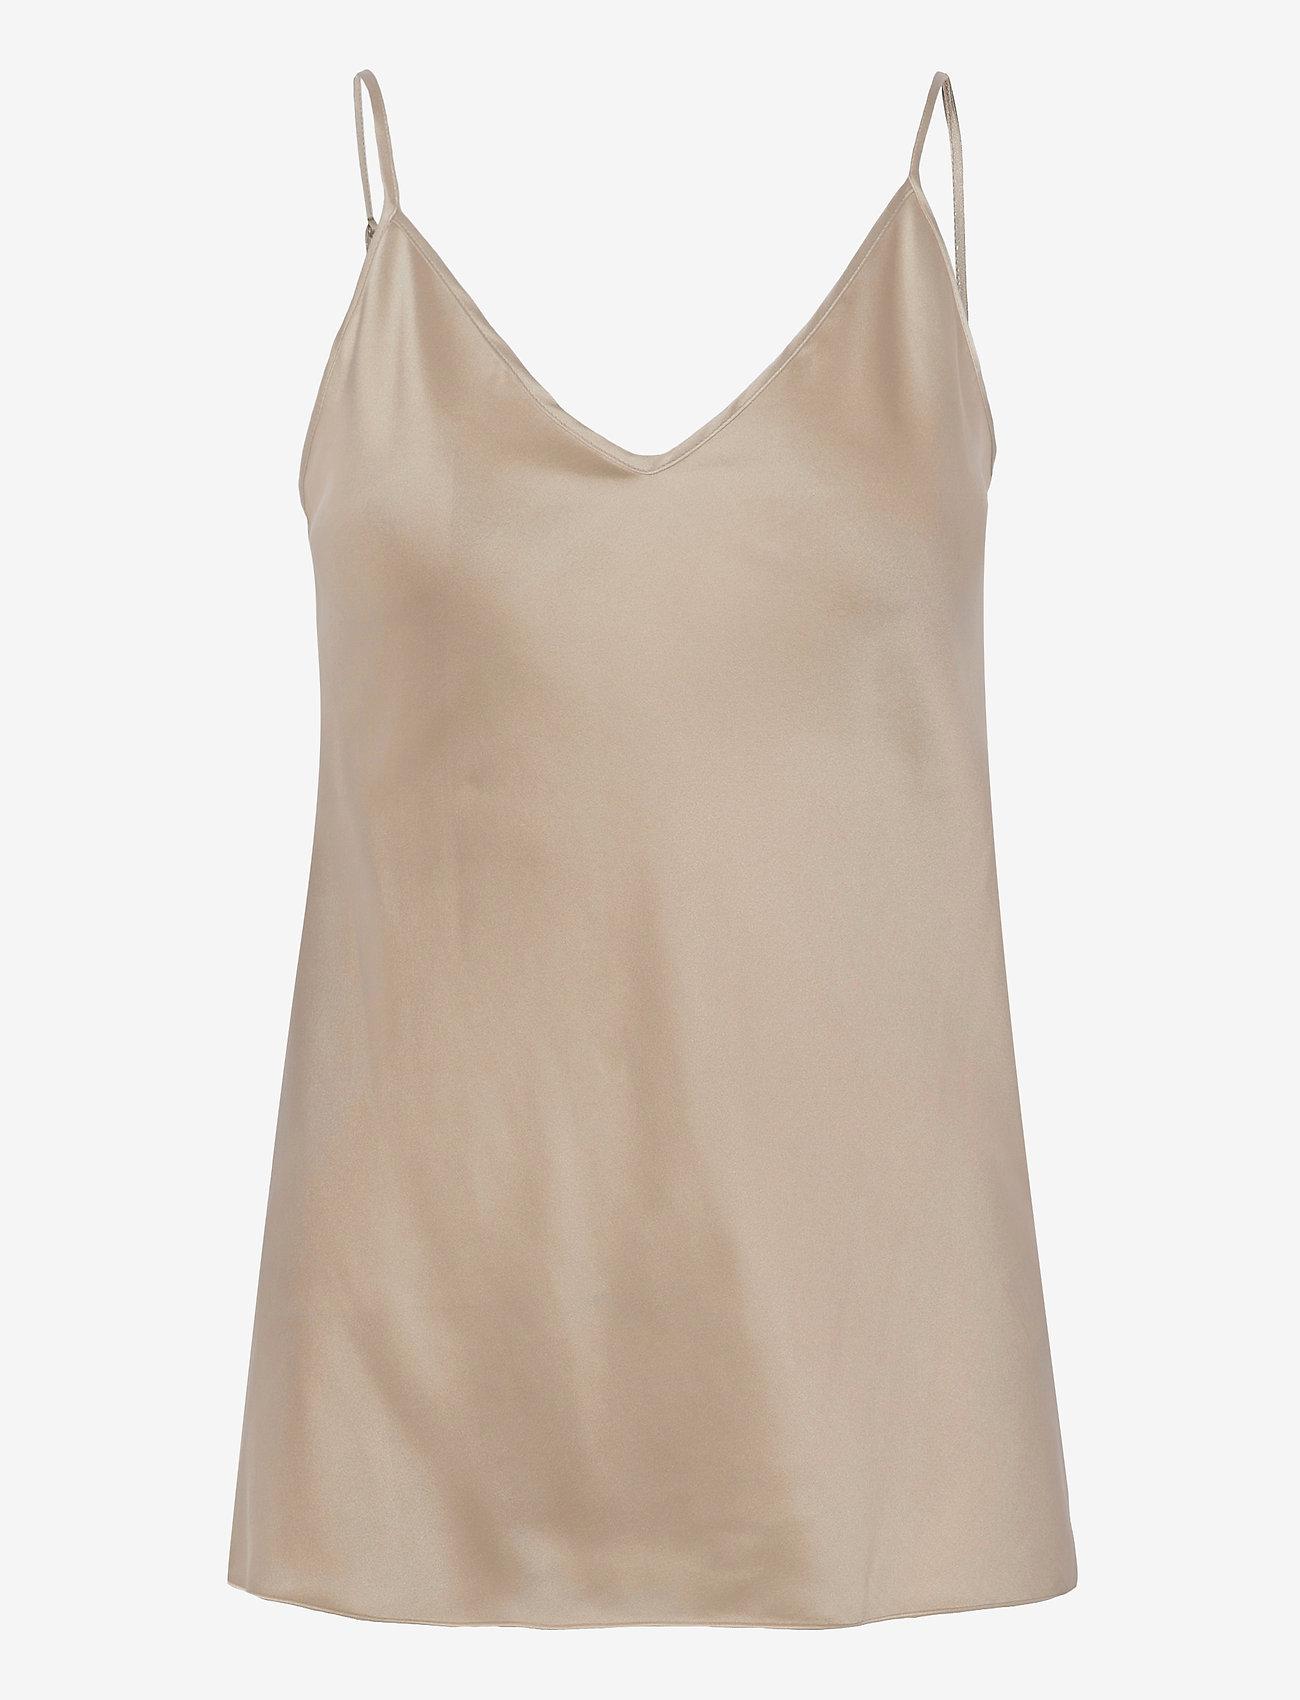 Max Mara Leisure - LUCCA - sleeveless blouses - ecru - 0